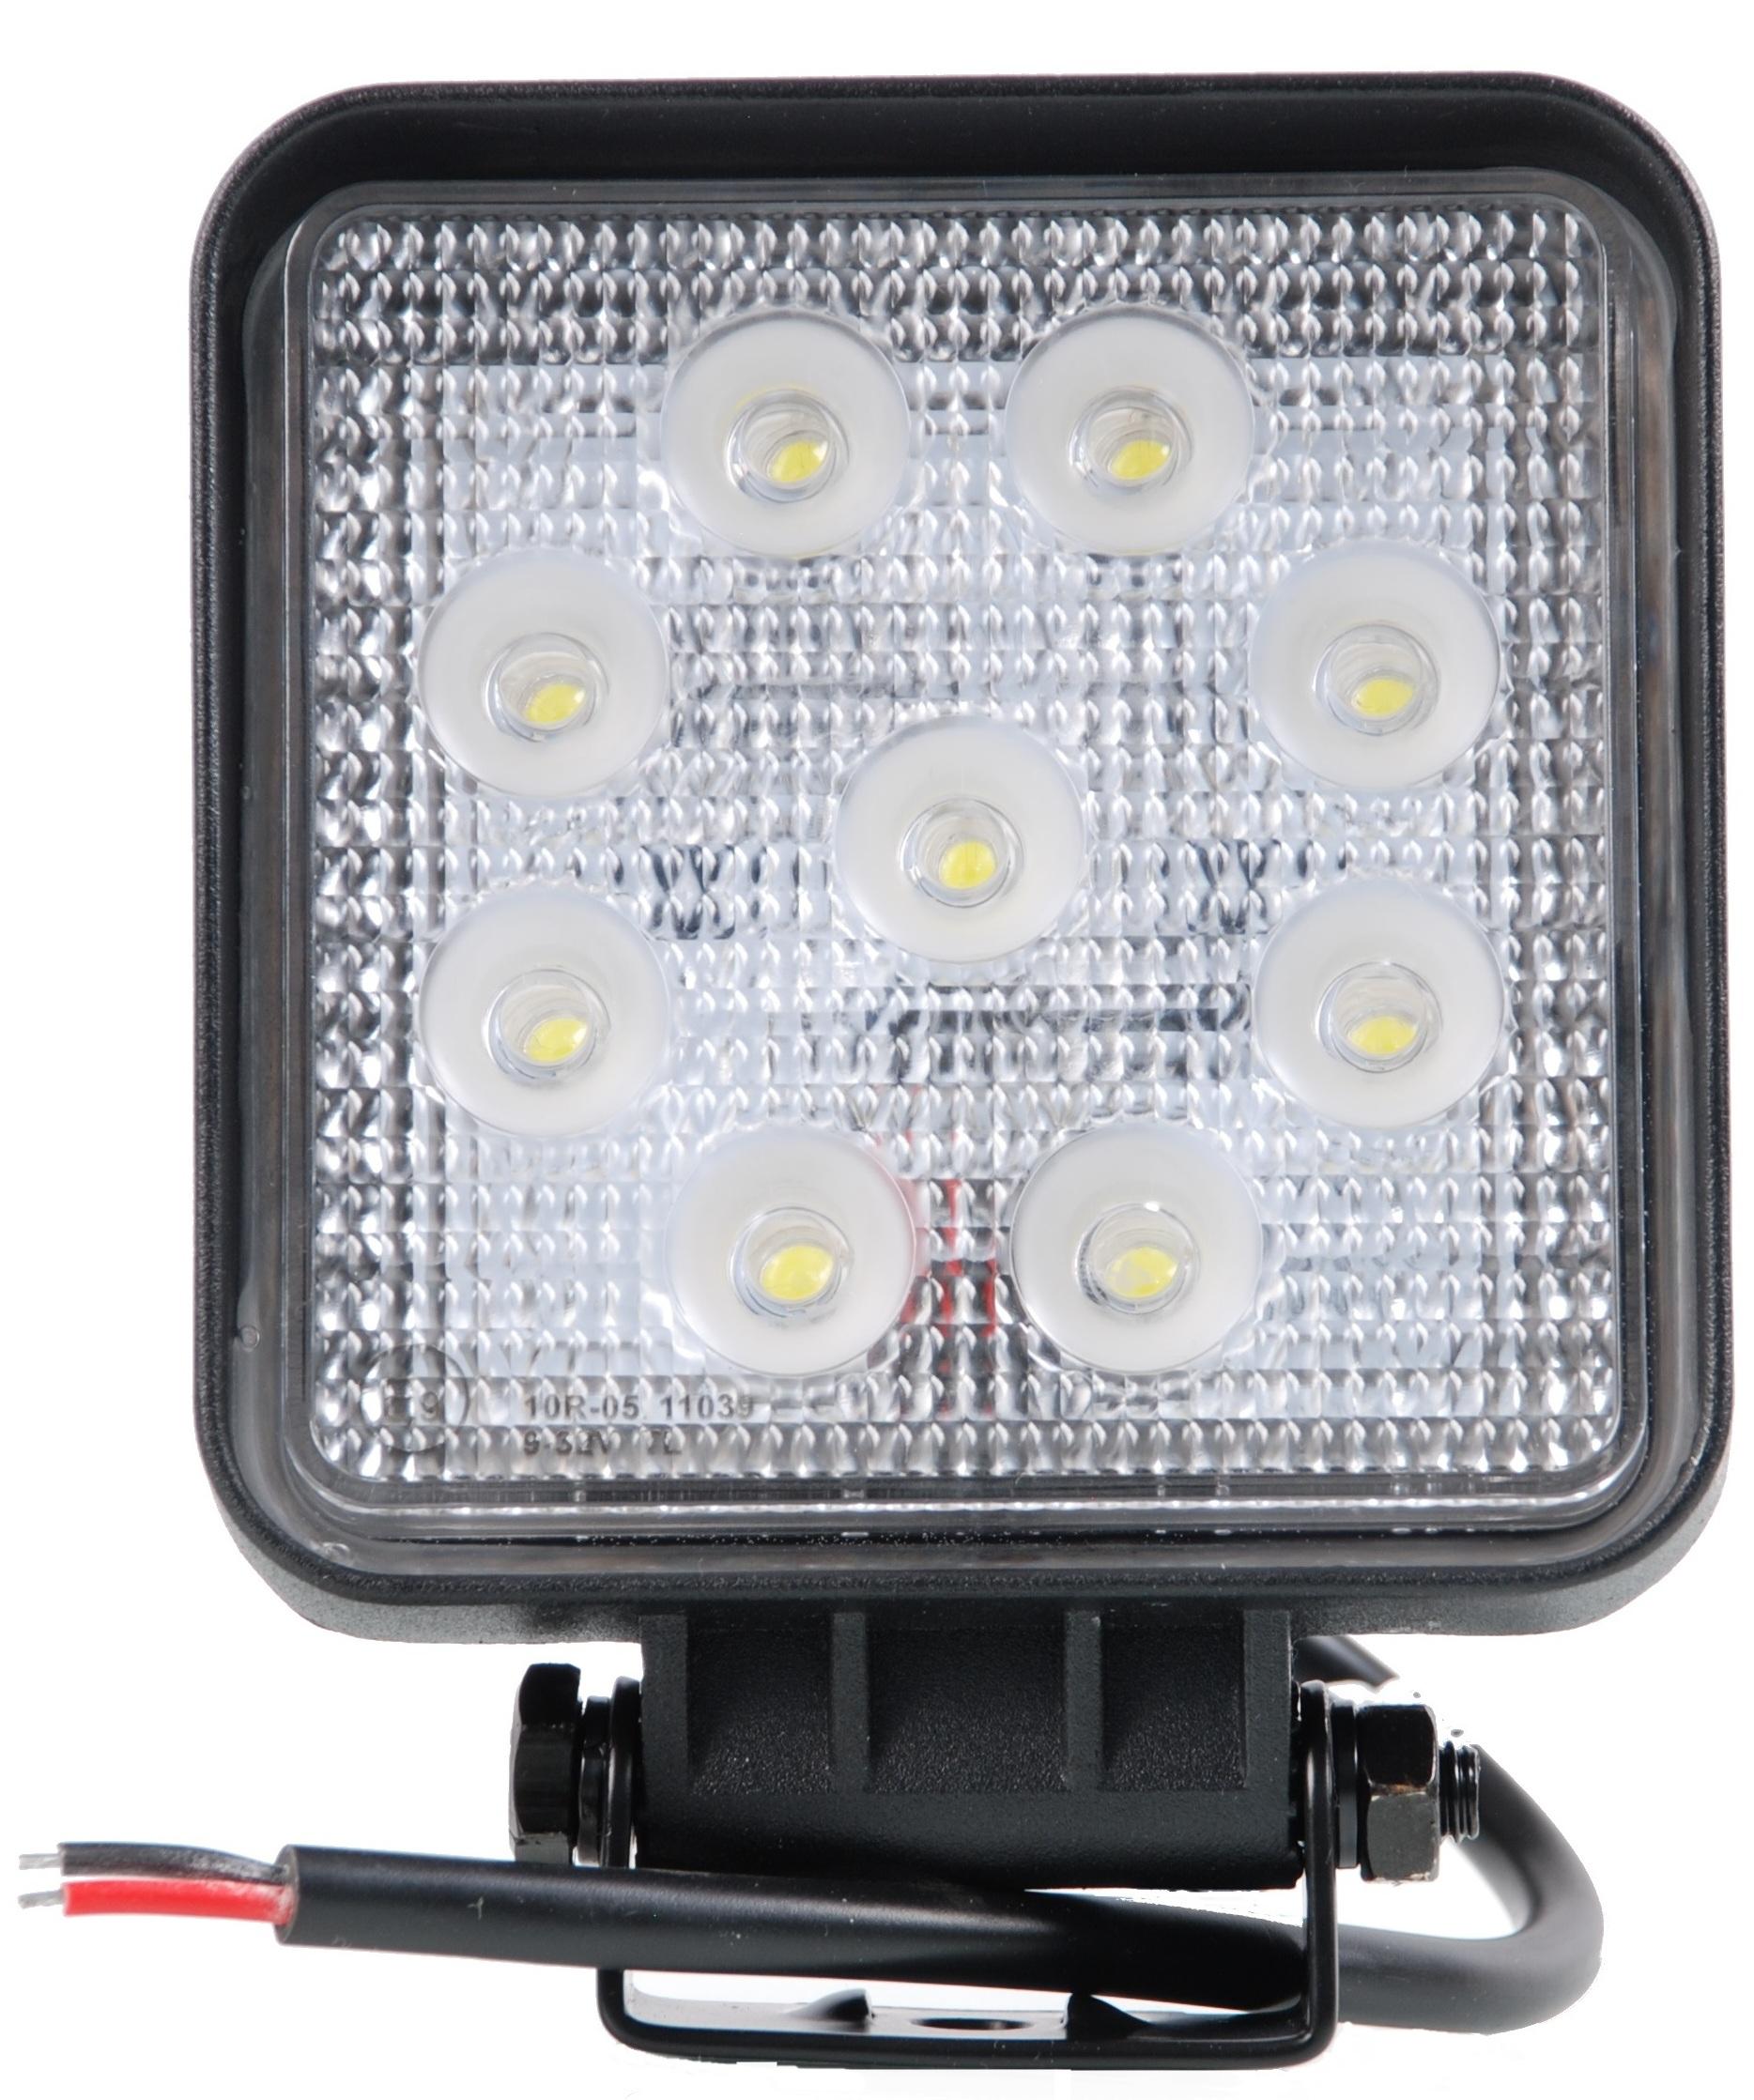 LAMPA ROBOCZA LED HALOGEN 27W HALOGEN SZPERACZ